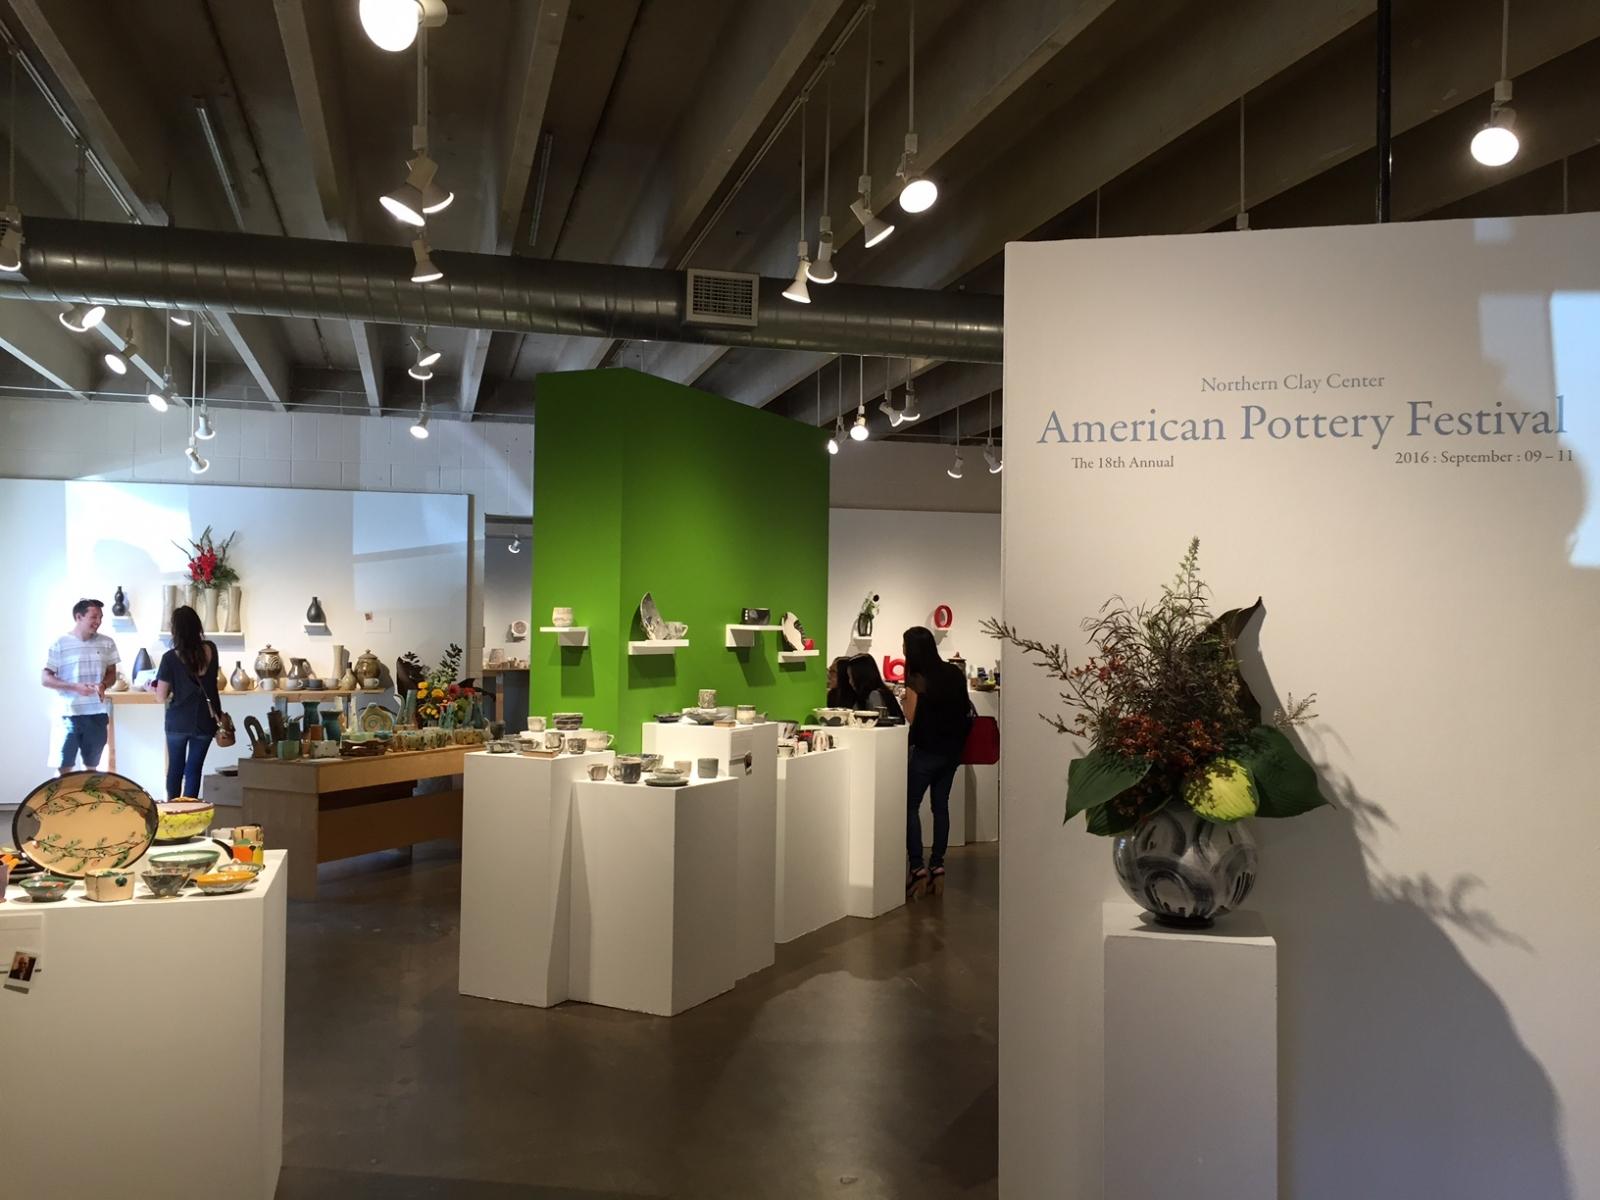 american pottery festival, northern clay center, fundraiser, event, art, local art, ceramics, minnesota journeys